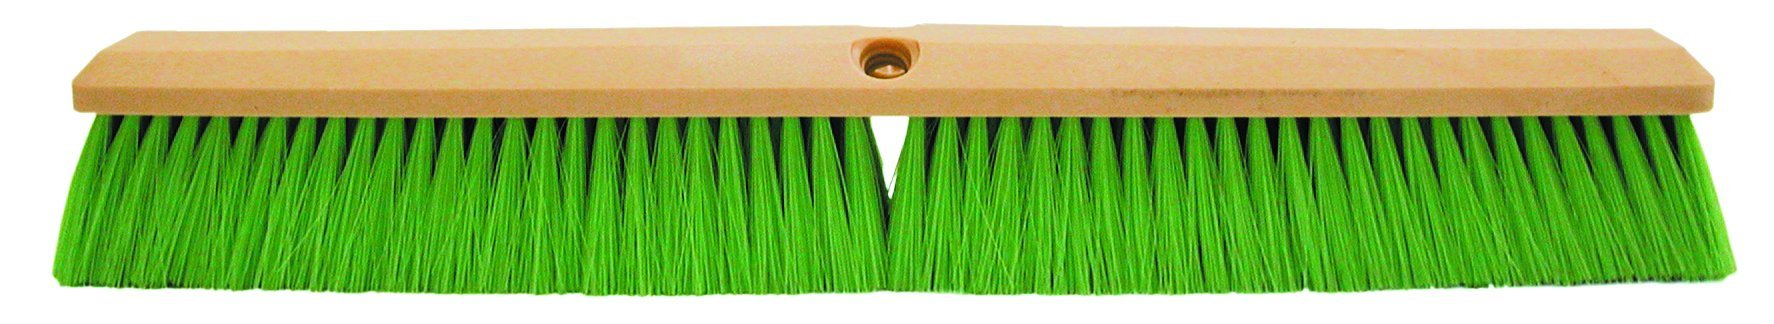 Magnolia Brush 3318-N Foam Plastic Block Vehicle Wash Brush, Flagged Nylon Bristles, 2-1/2'' Trim, 18'' Length, Green (Case of 12)